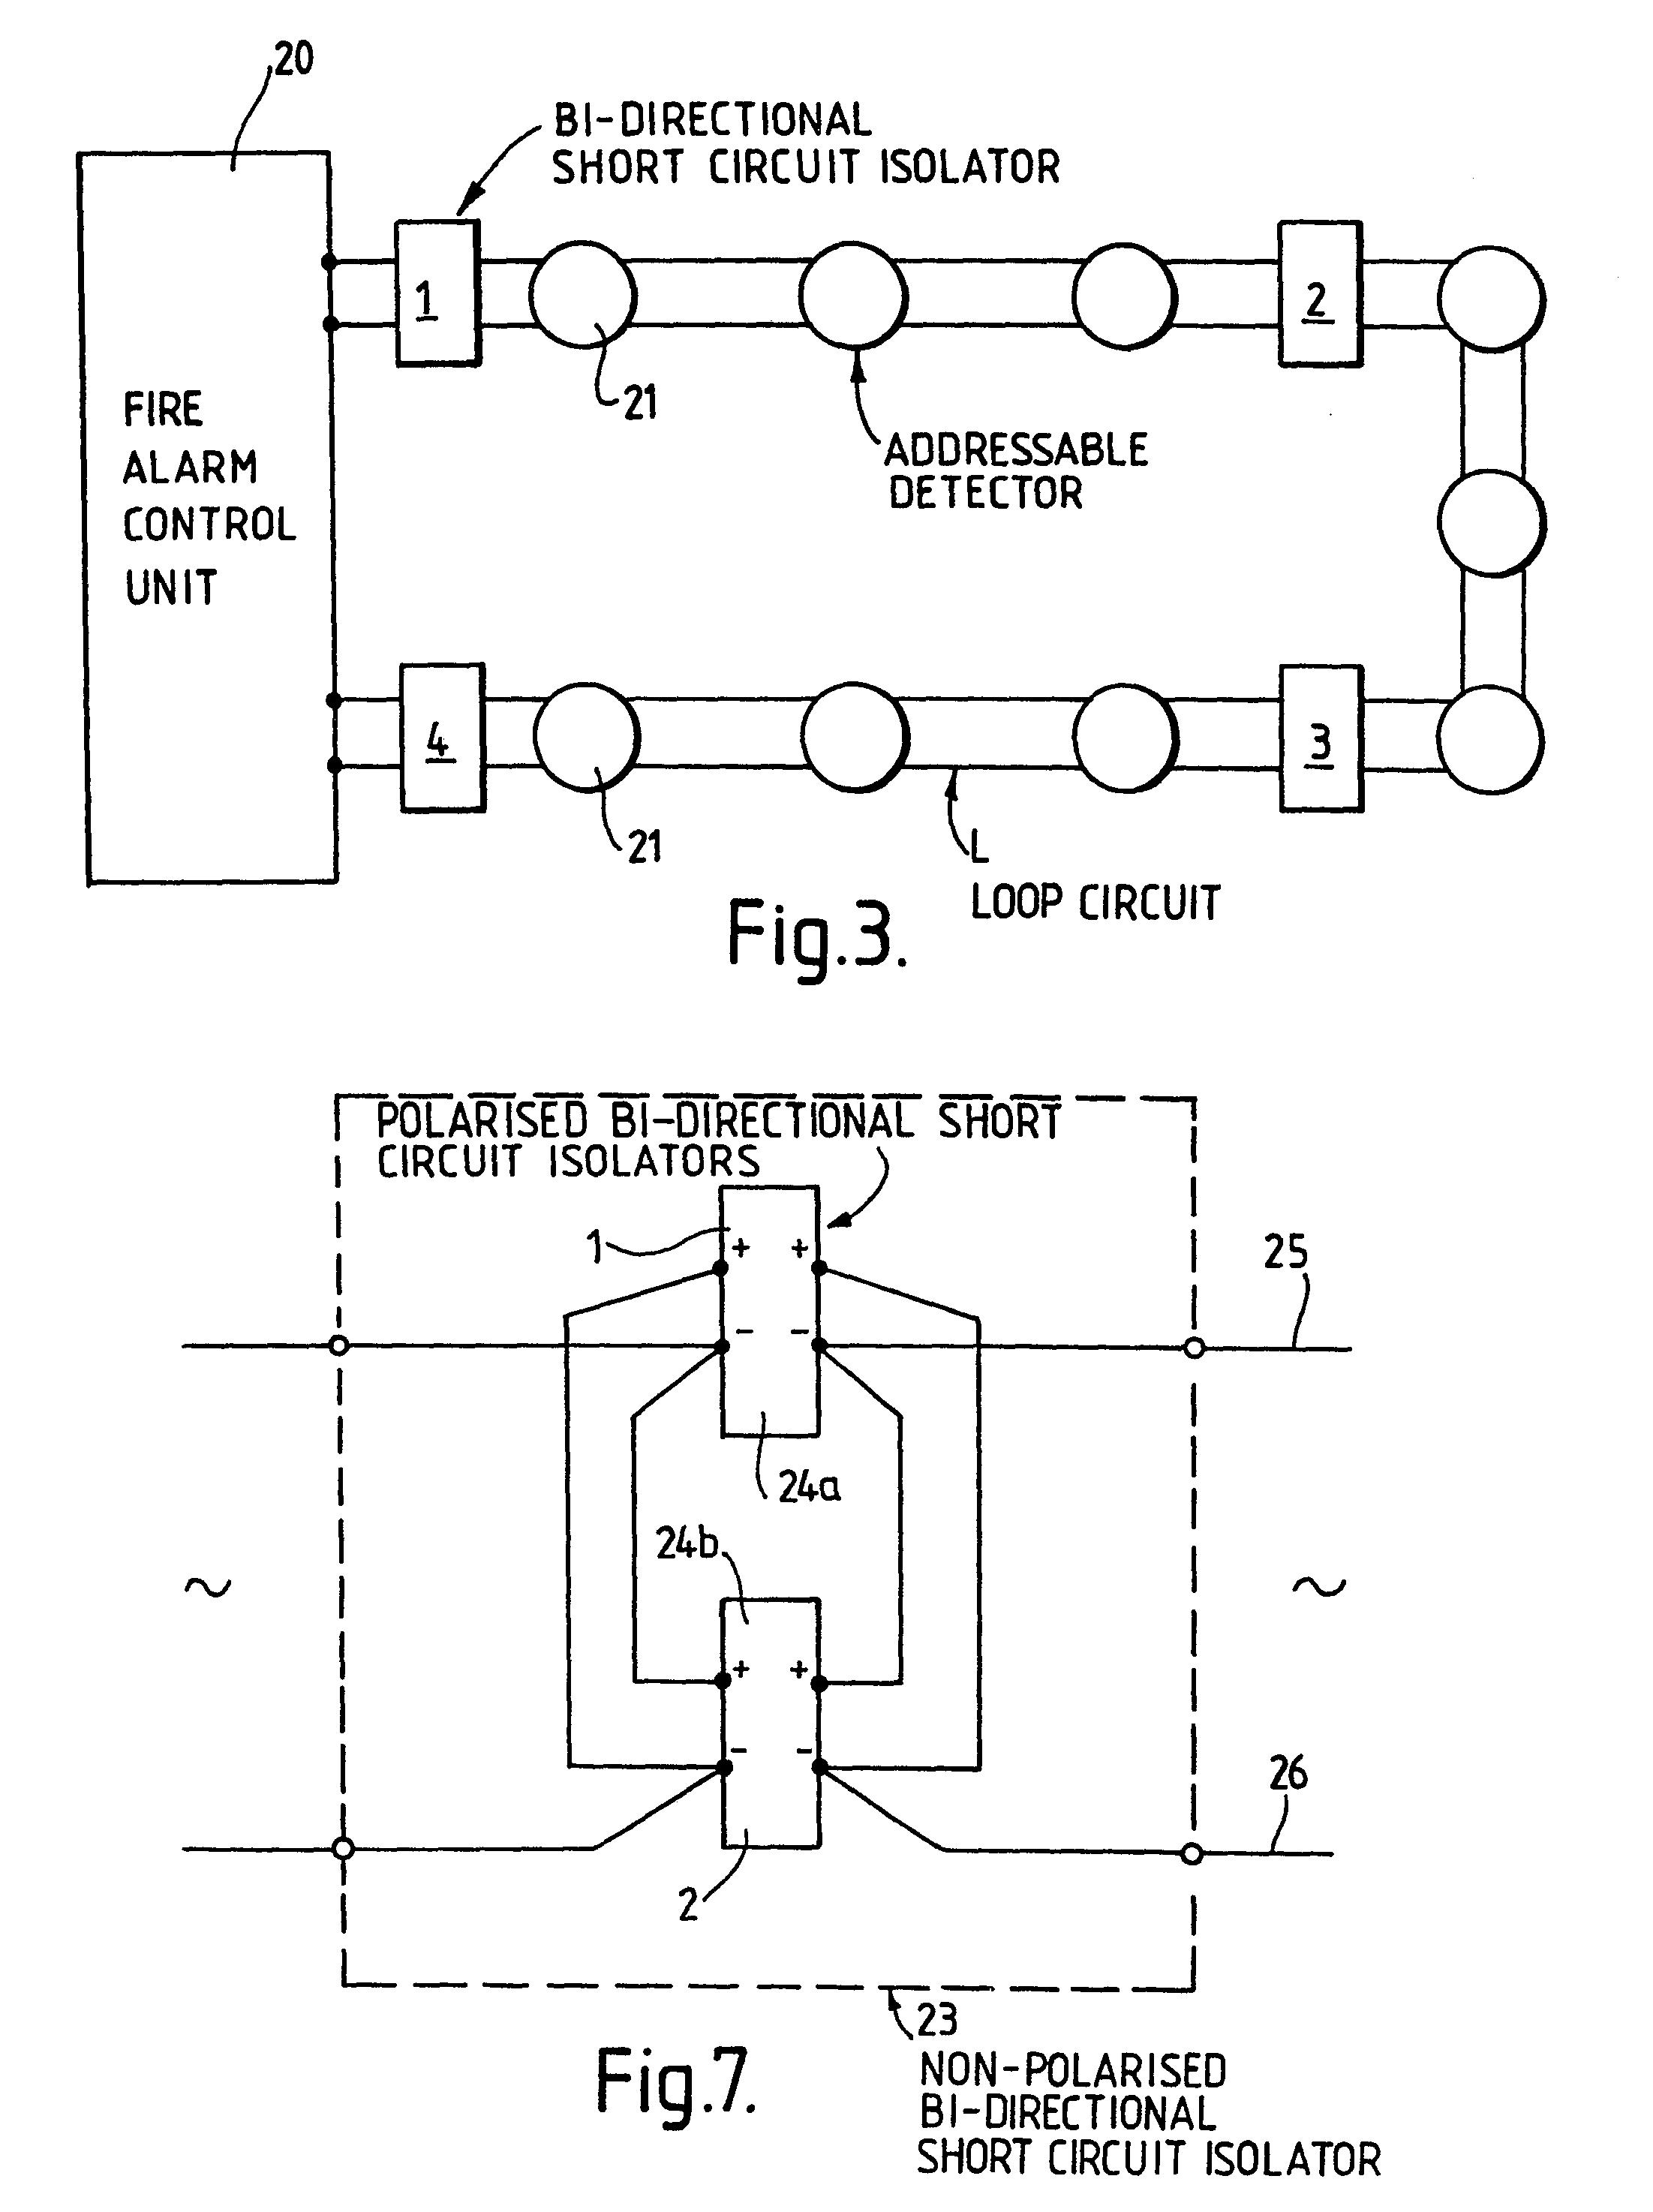 Semi Addressable Fire Alarm System Wiring Diagram - 4k Wallpapers